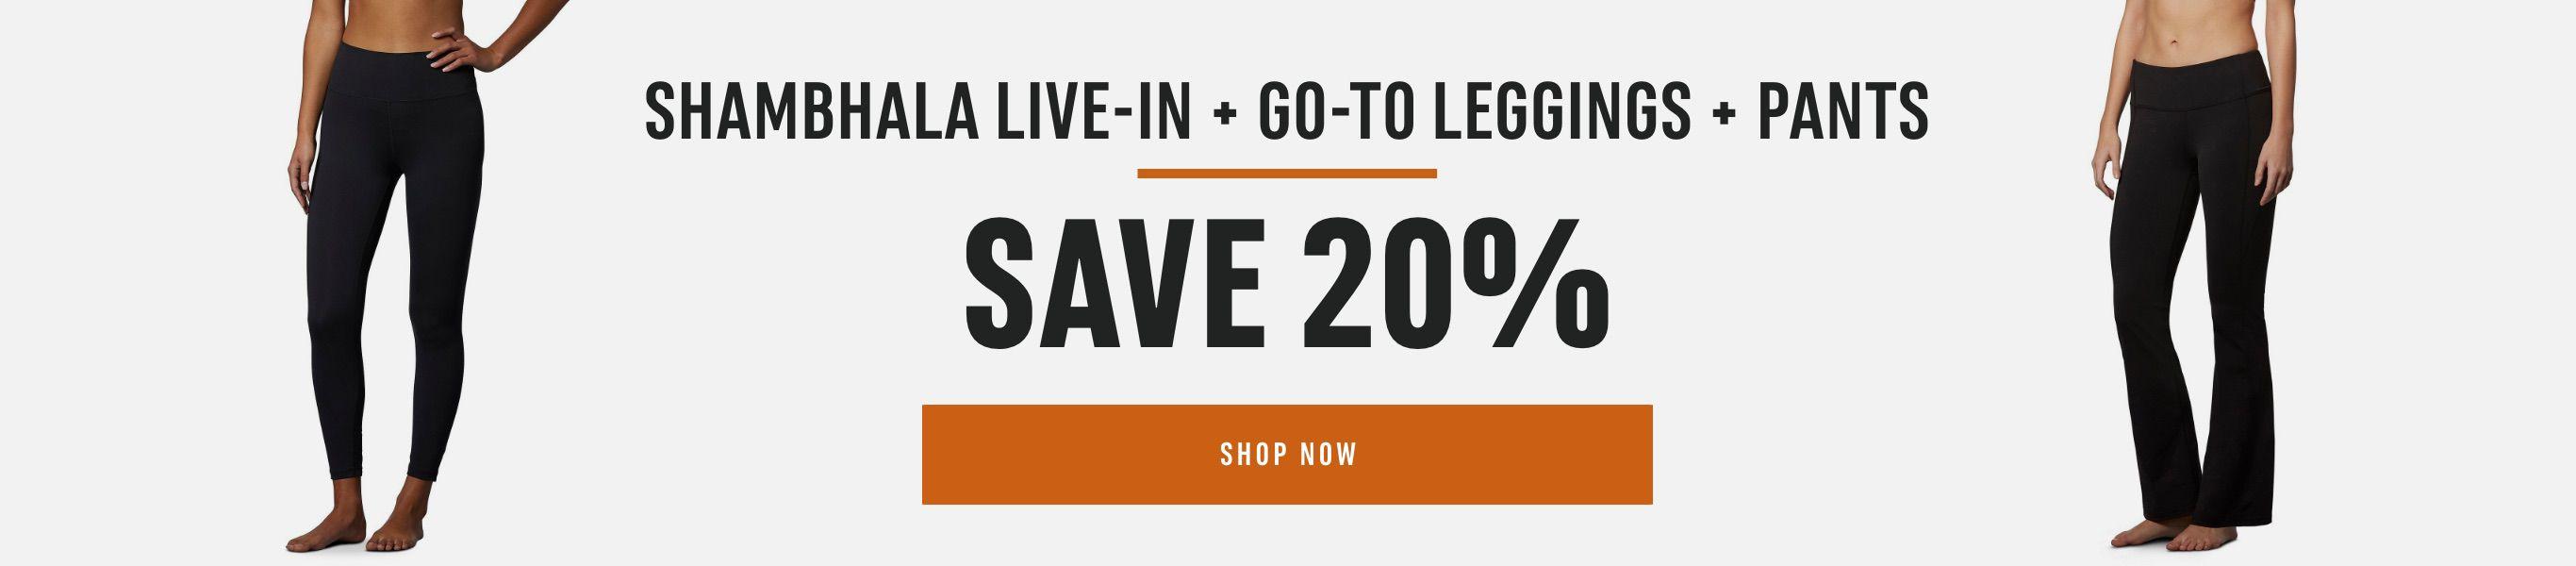 Shambhala Live-In + Go-To Leggings + Pants – Save 20%